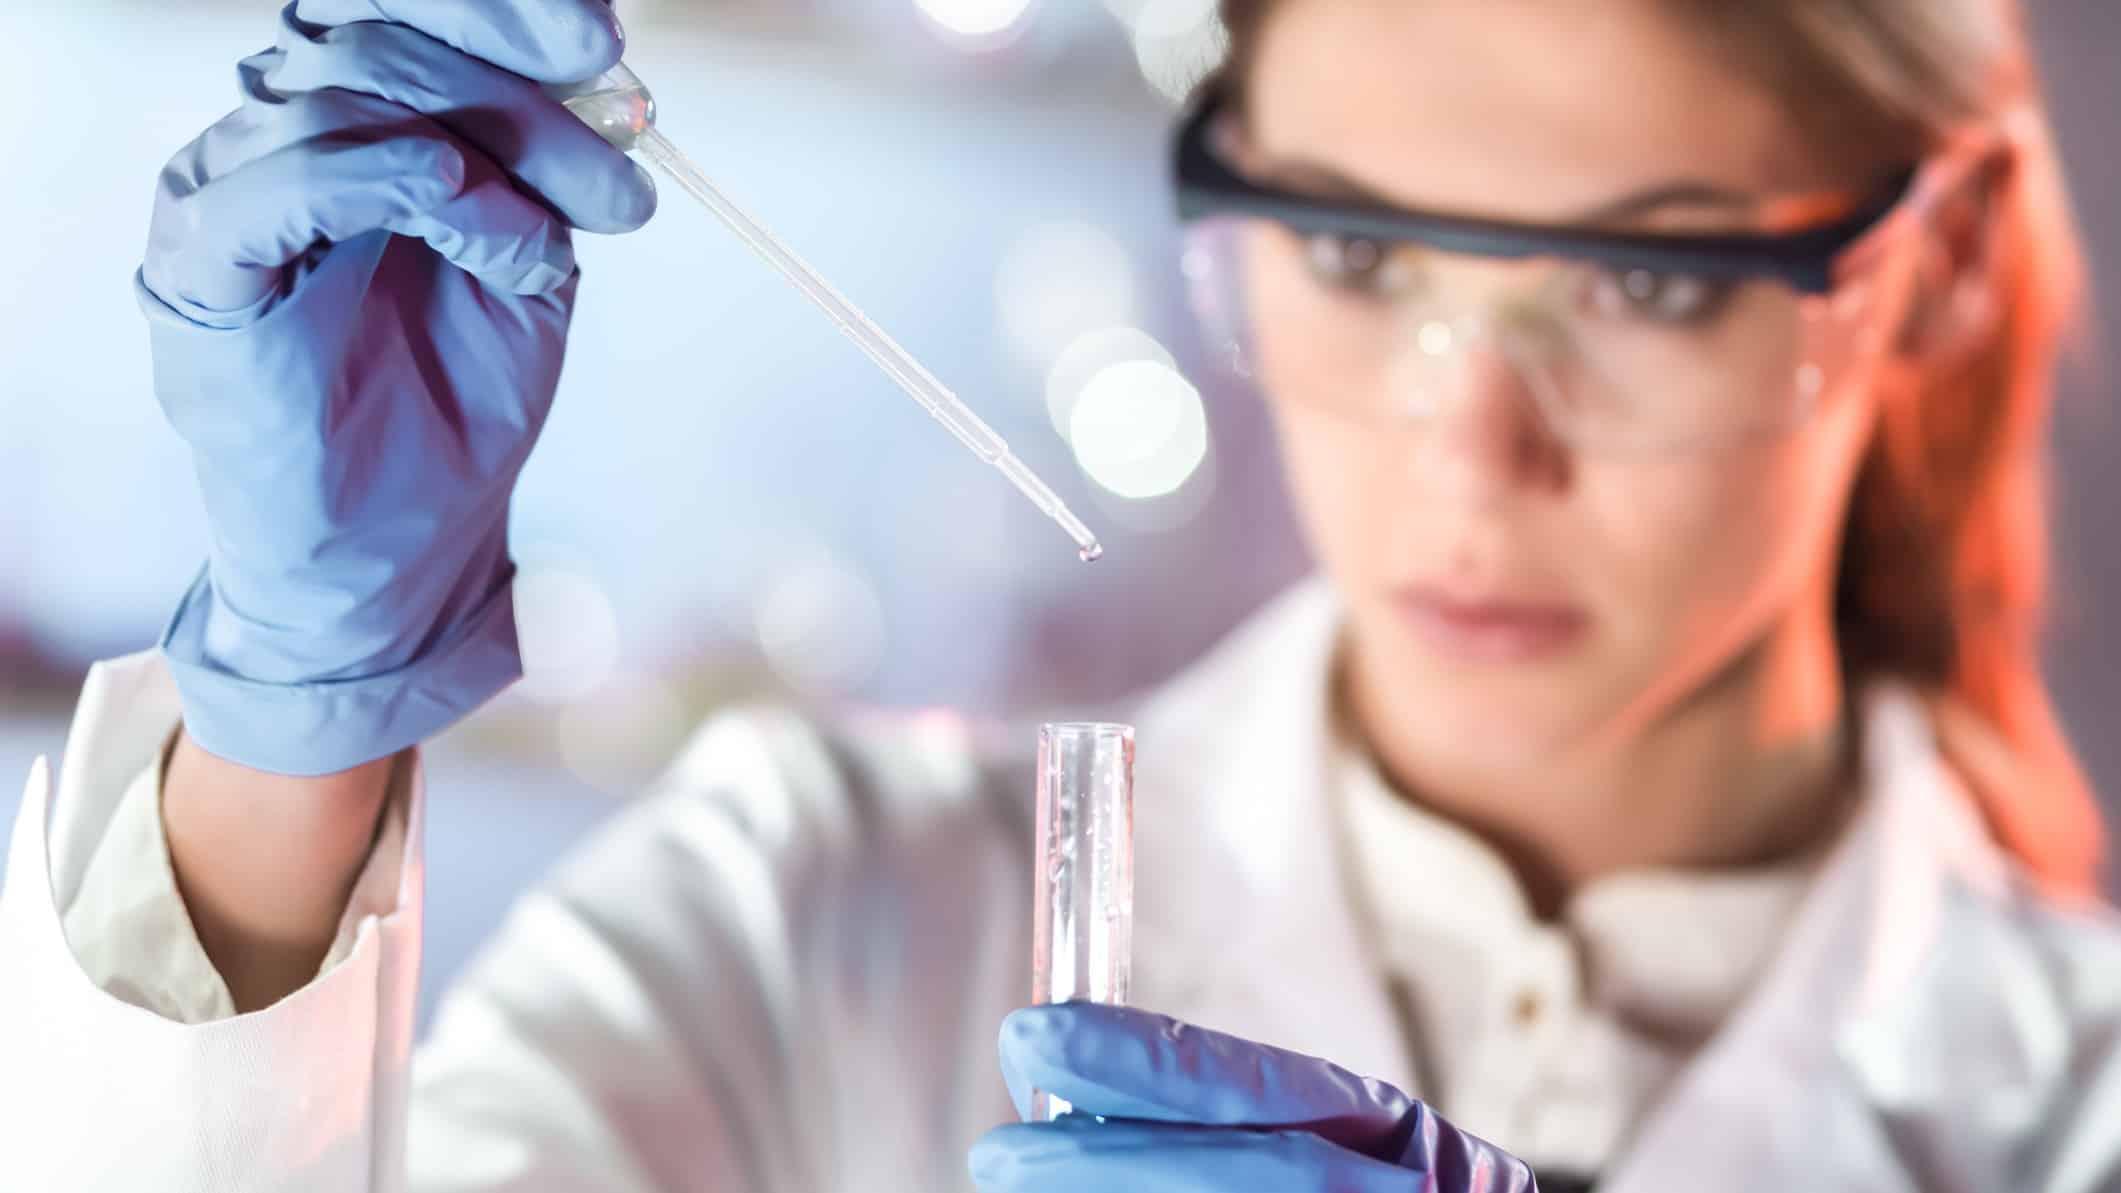 woman in lab coat conducting testing representing mesoblast share price